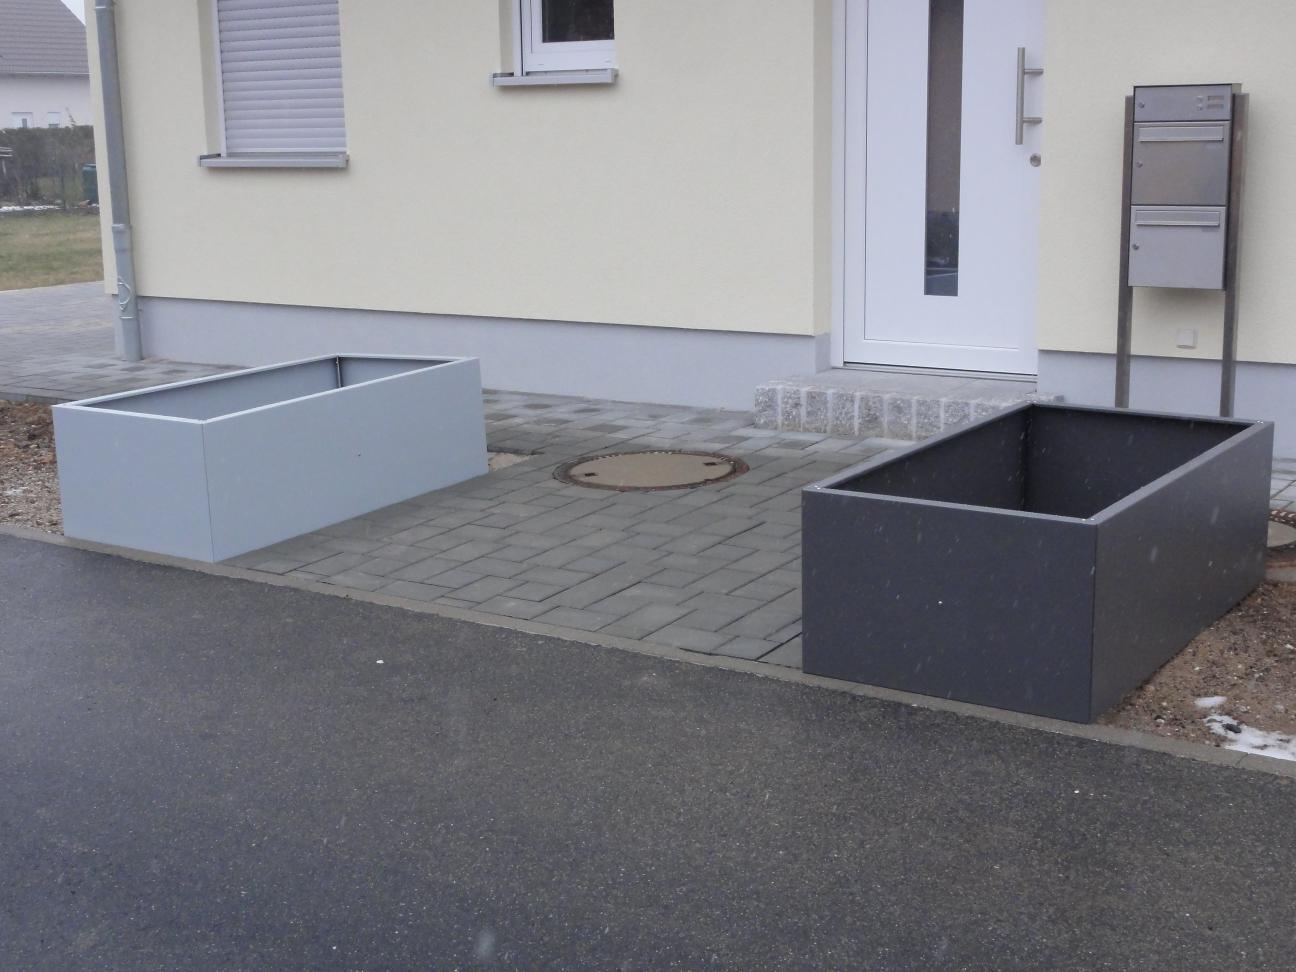 hochbeet urban aus metall 1 5 m x 0 55 m x 0 5 m beschichtet. Black Bedroom Furniture Sets. Home Design Ideas